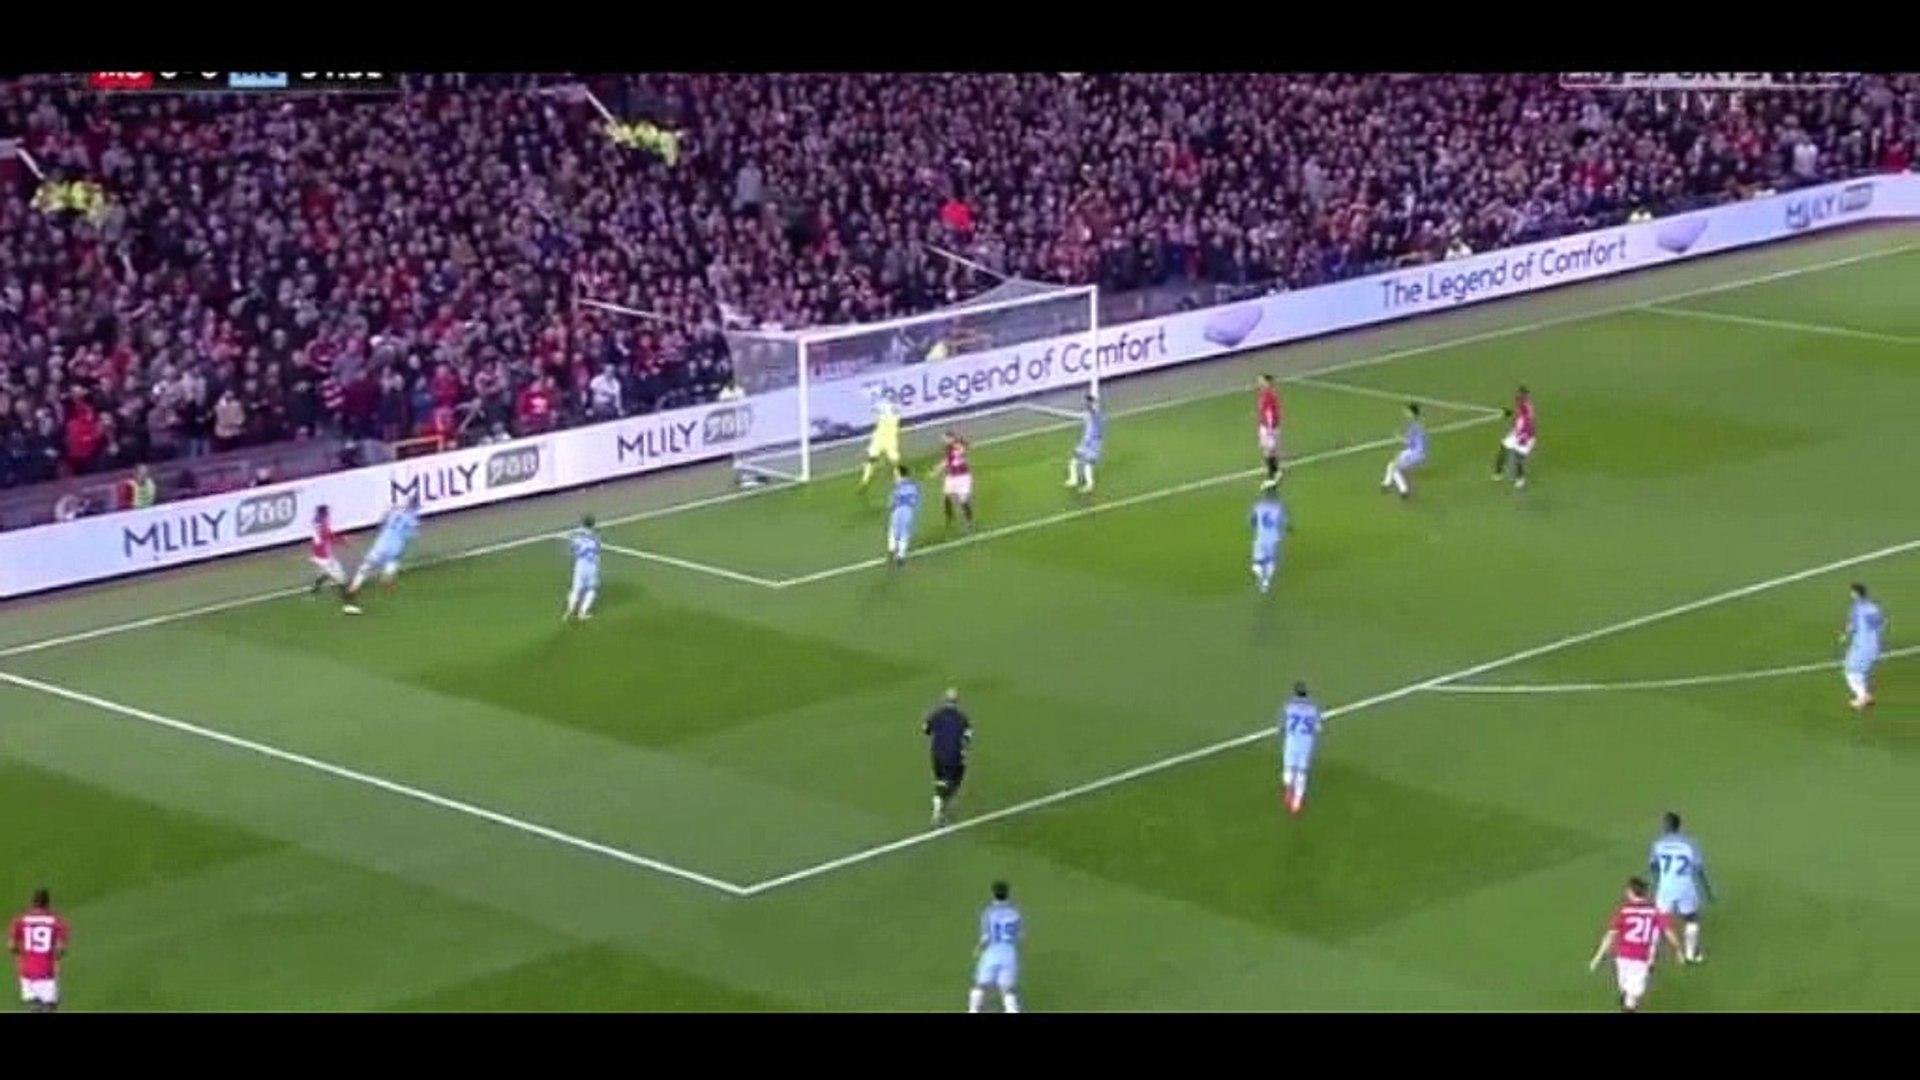 EFL Cup | Manchester United 1-0 Manchester City | Video bola, berita bola, cuplikan gol